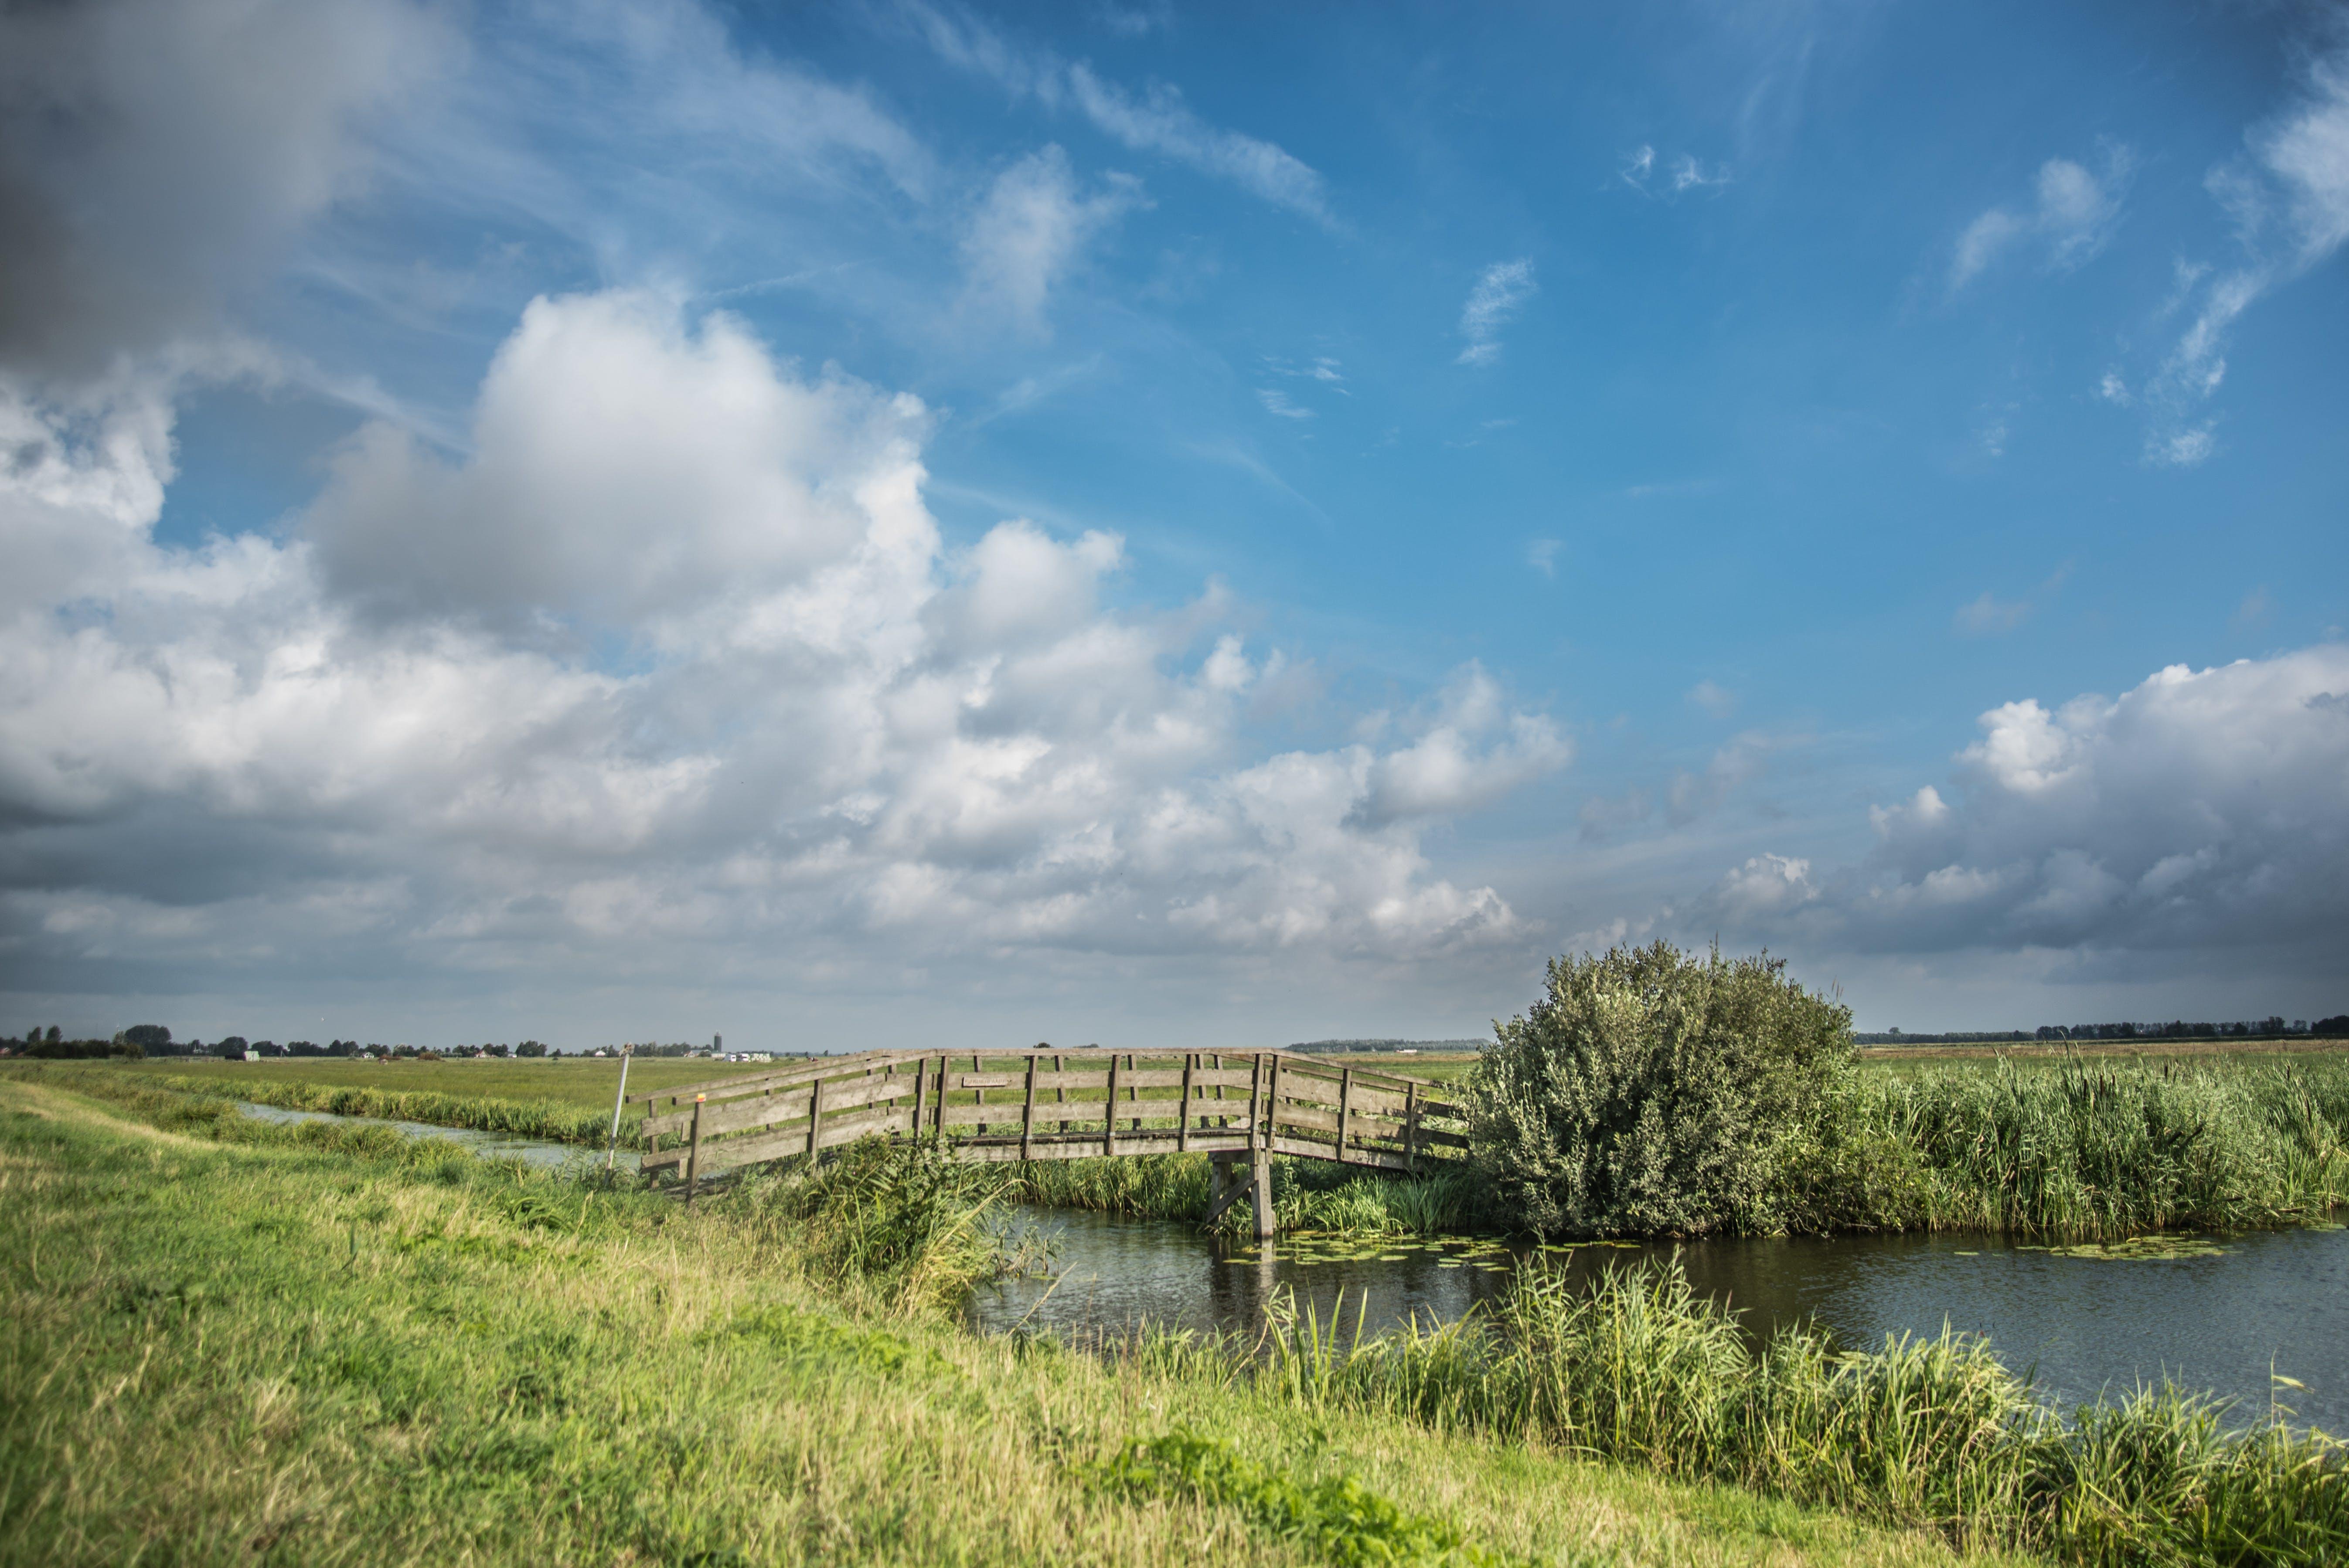 Gratis arkivbilde med åker, bro, dagslys, dyrket jord